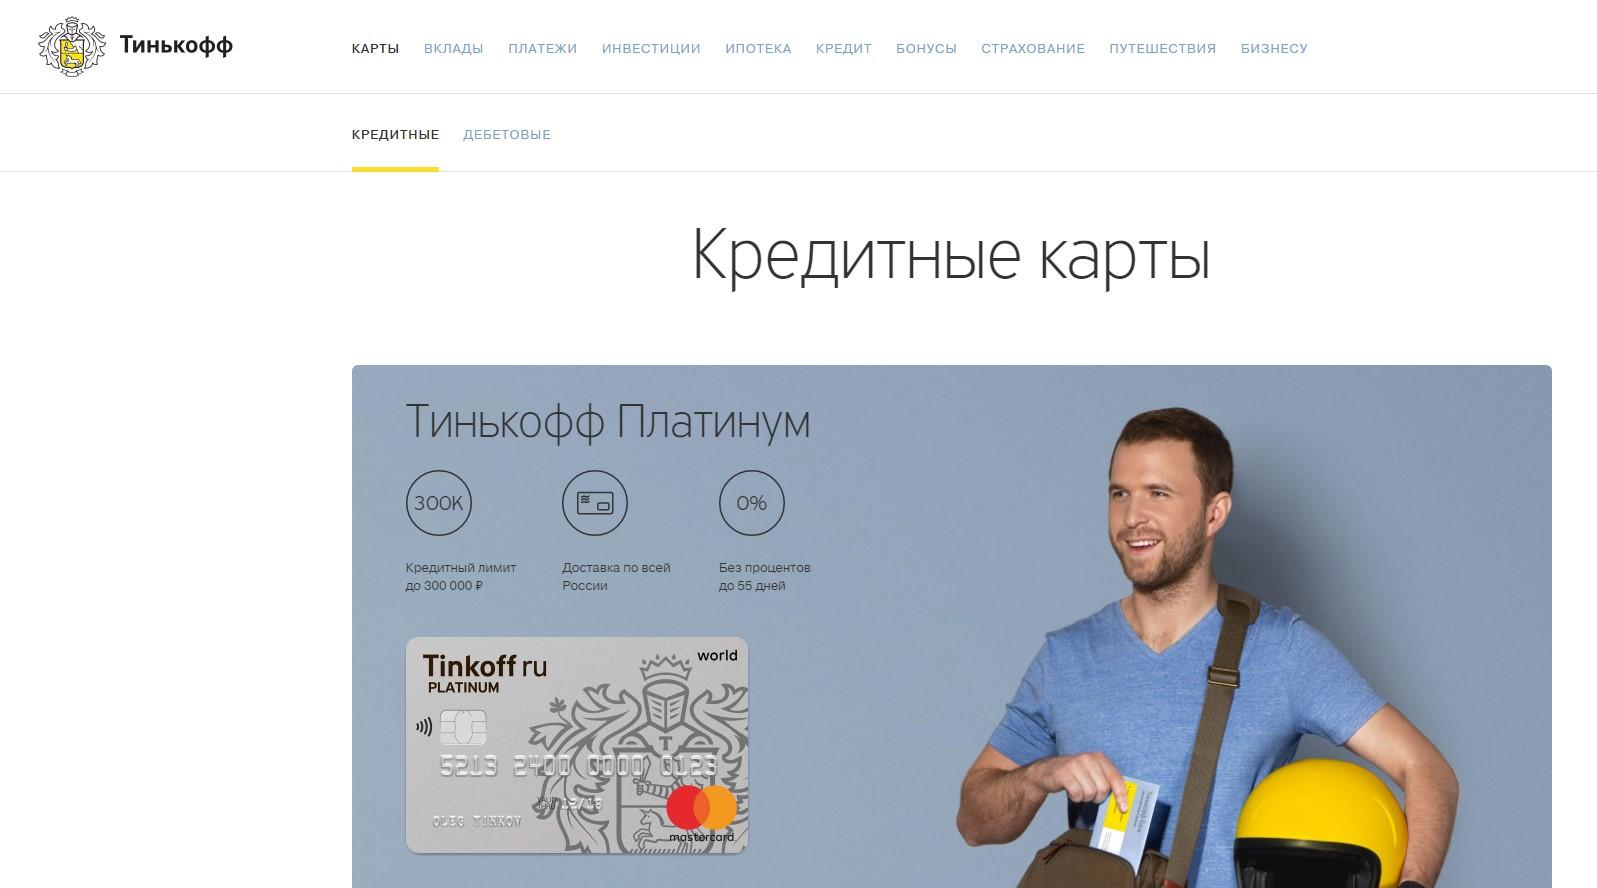 Веб-сайт ТКС